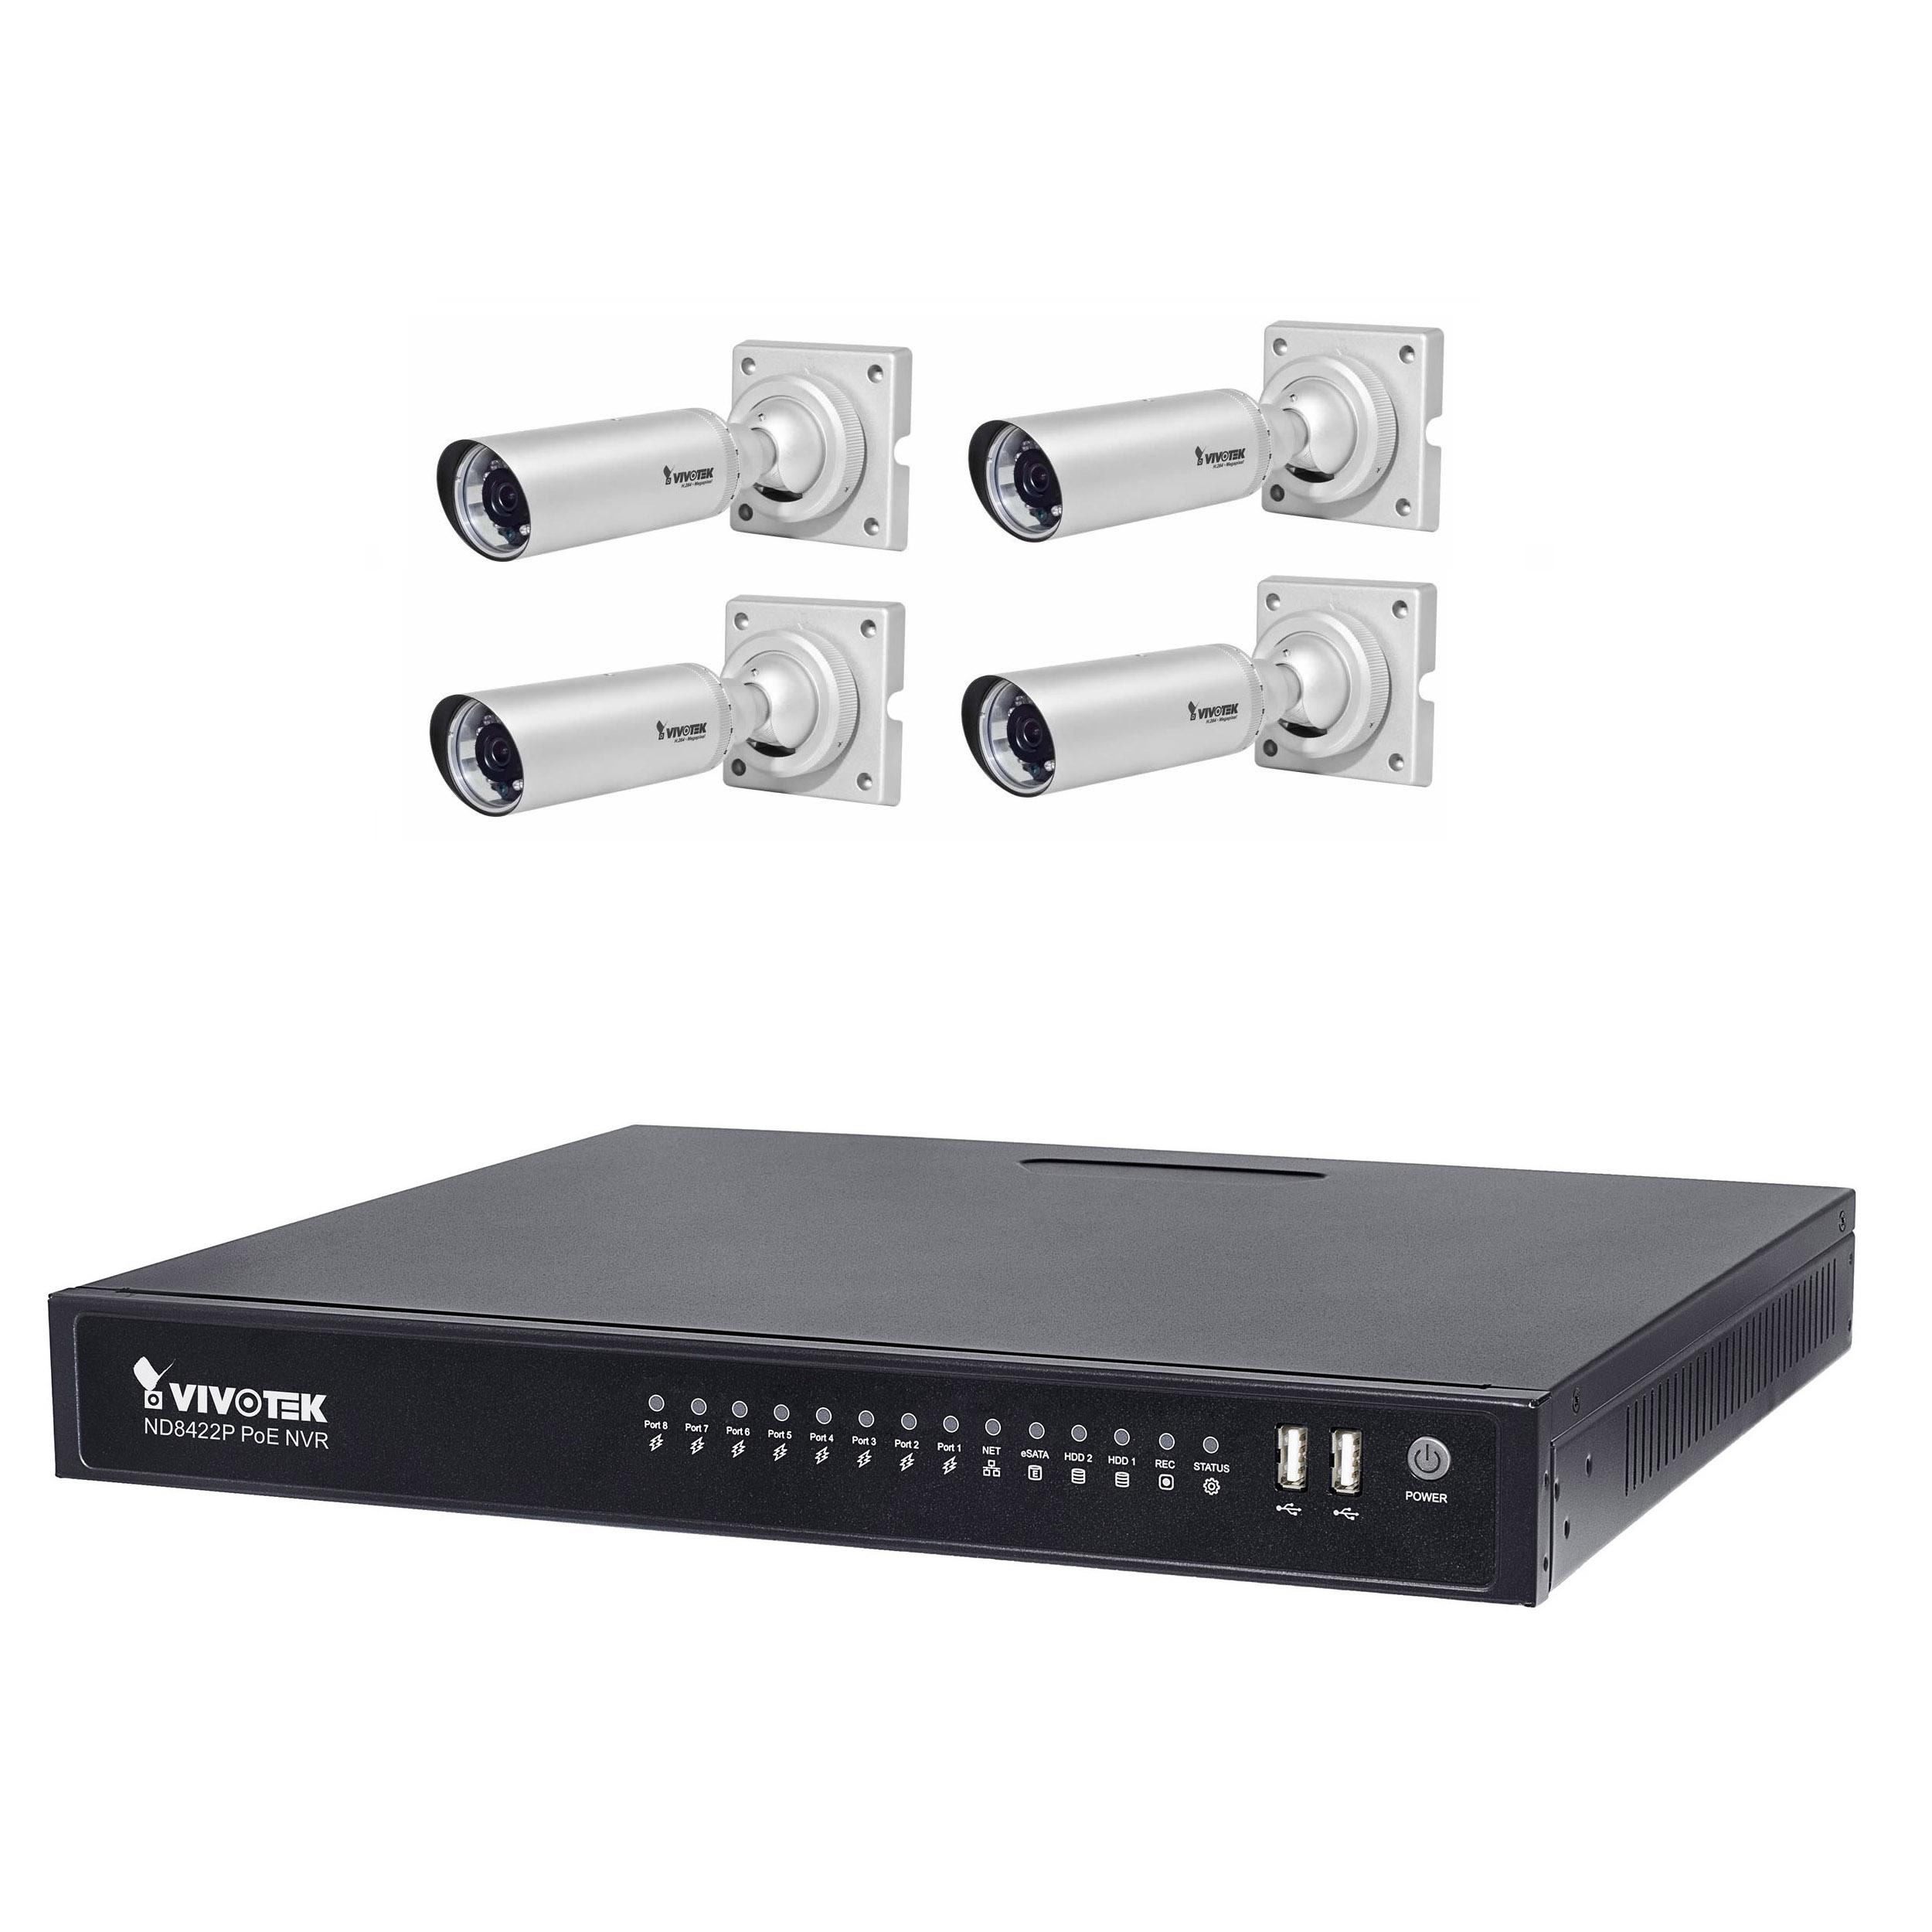 سیستم امنیتی ویوتک مدل ND8422P/IB8354Cx4 Solution Kit